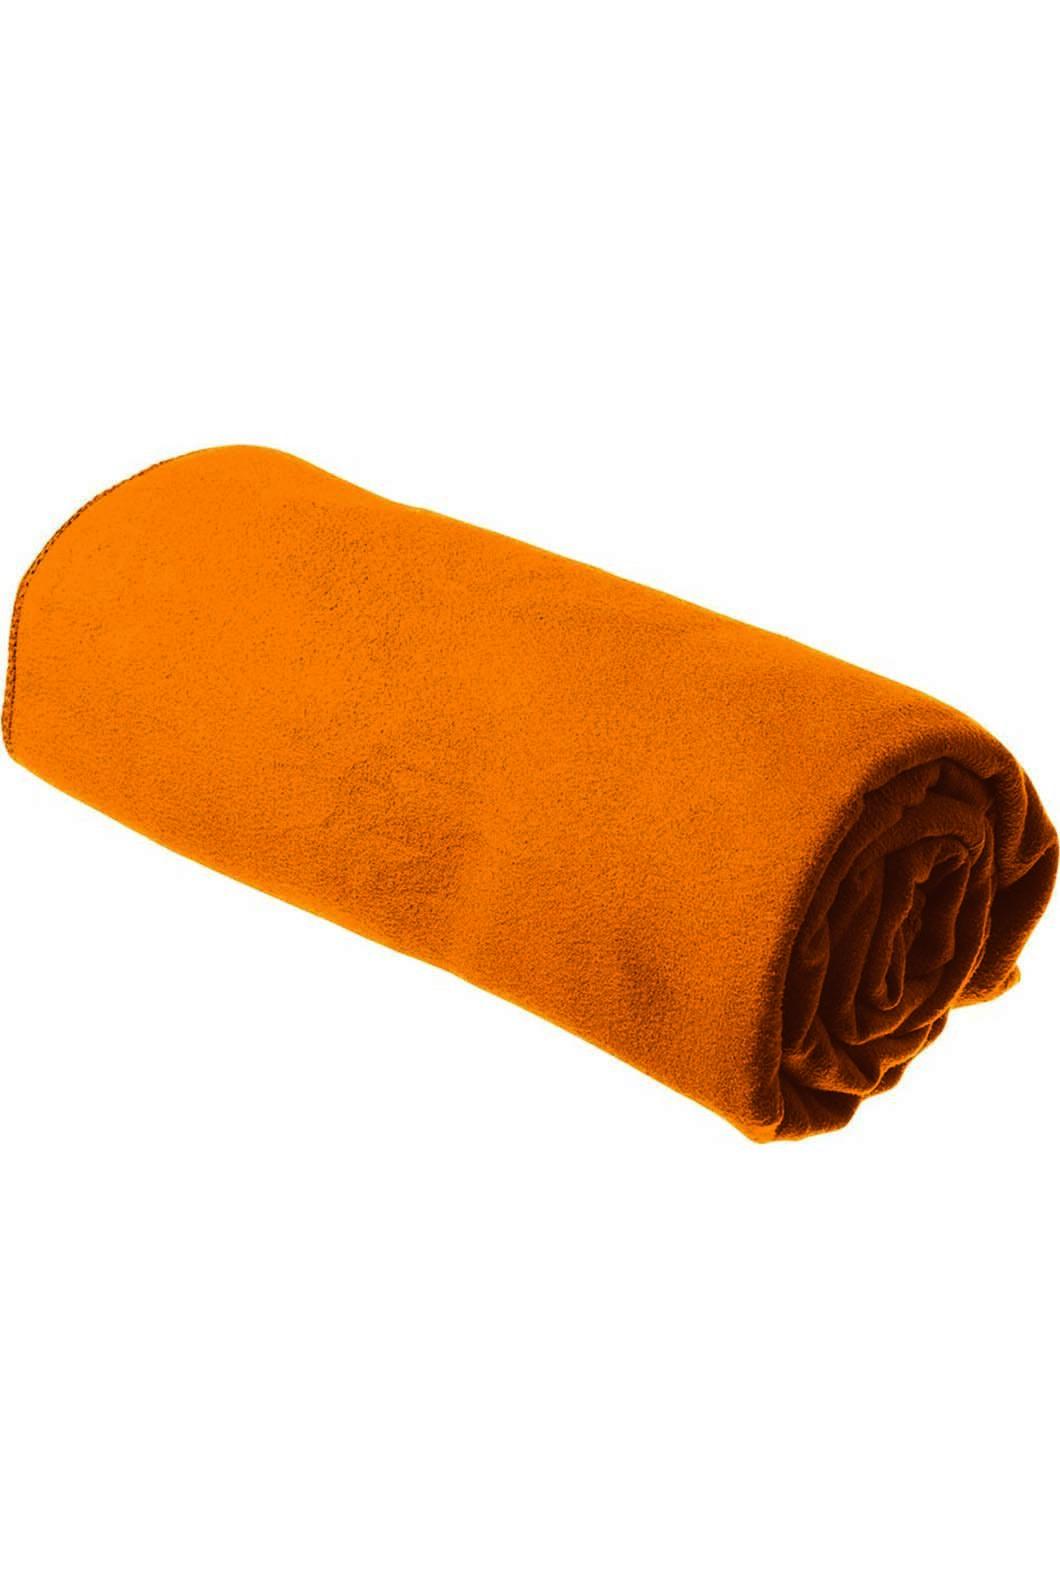 Sea to Summit Drylite Towel, None, hi-res